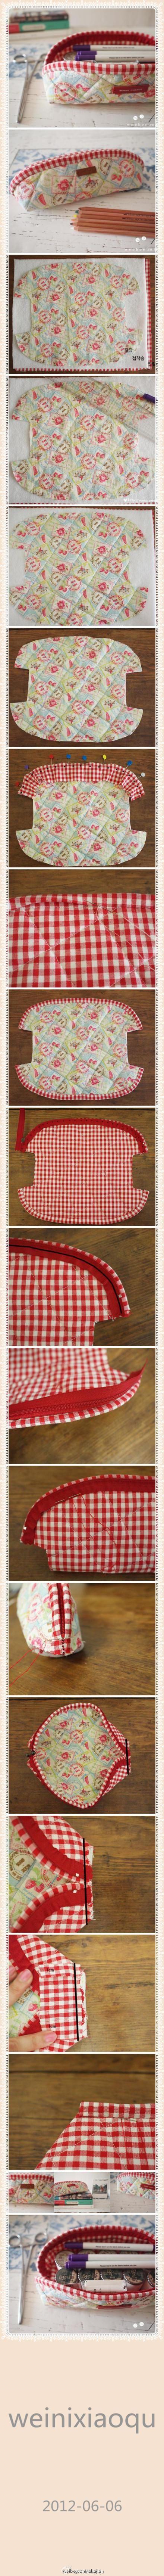 Cute zippered pouch